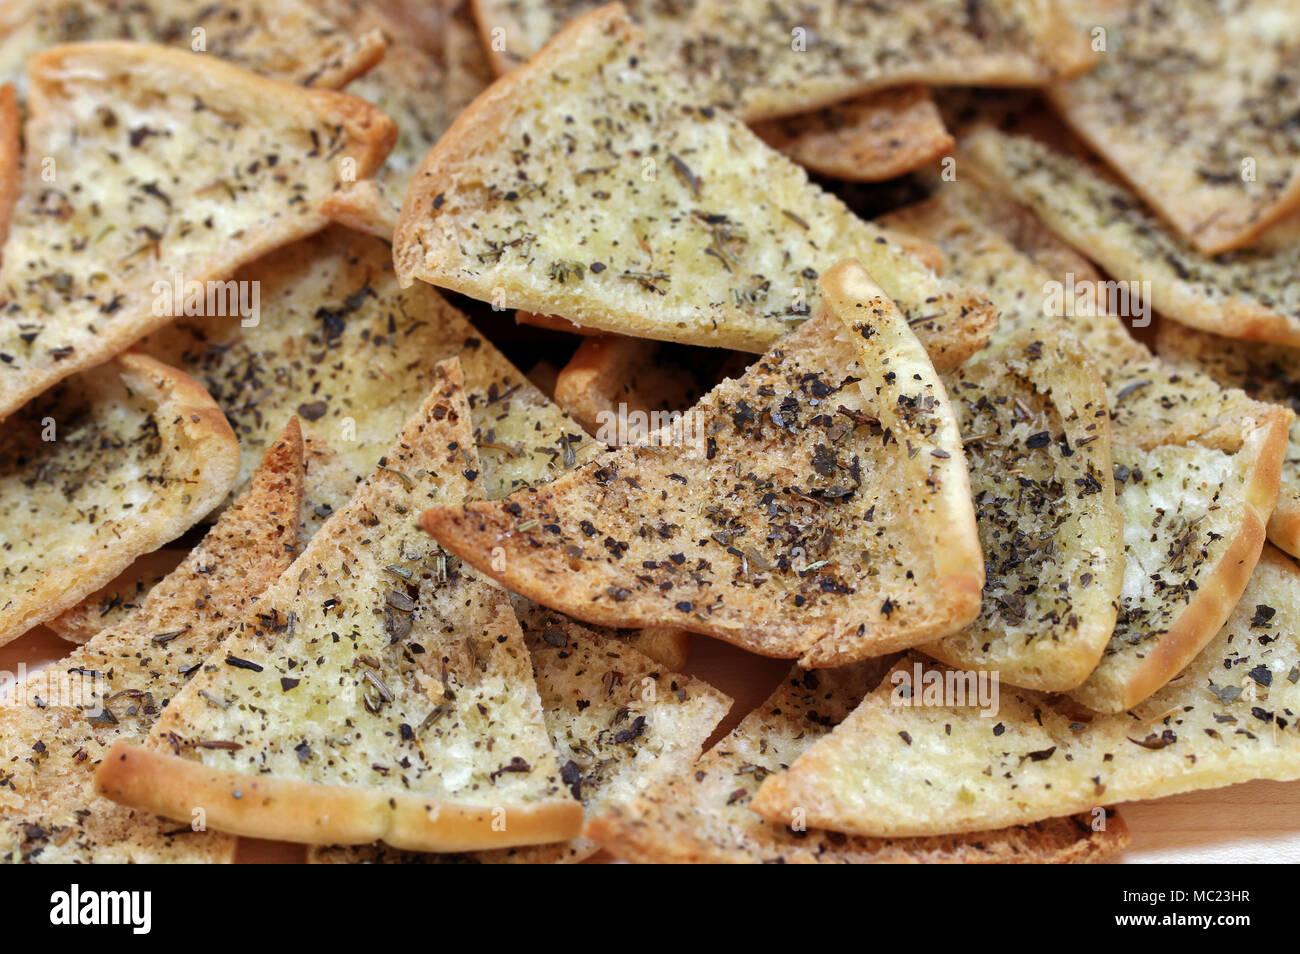 Hausgemachte würzige Pita Chips, Makro, Vollbild mit selektiven Fokus. Stockbild